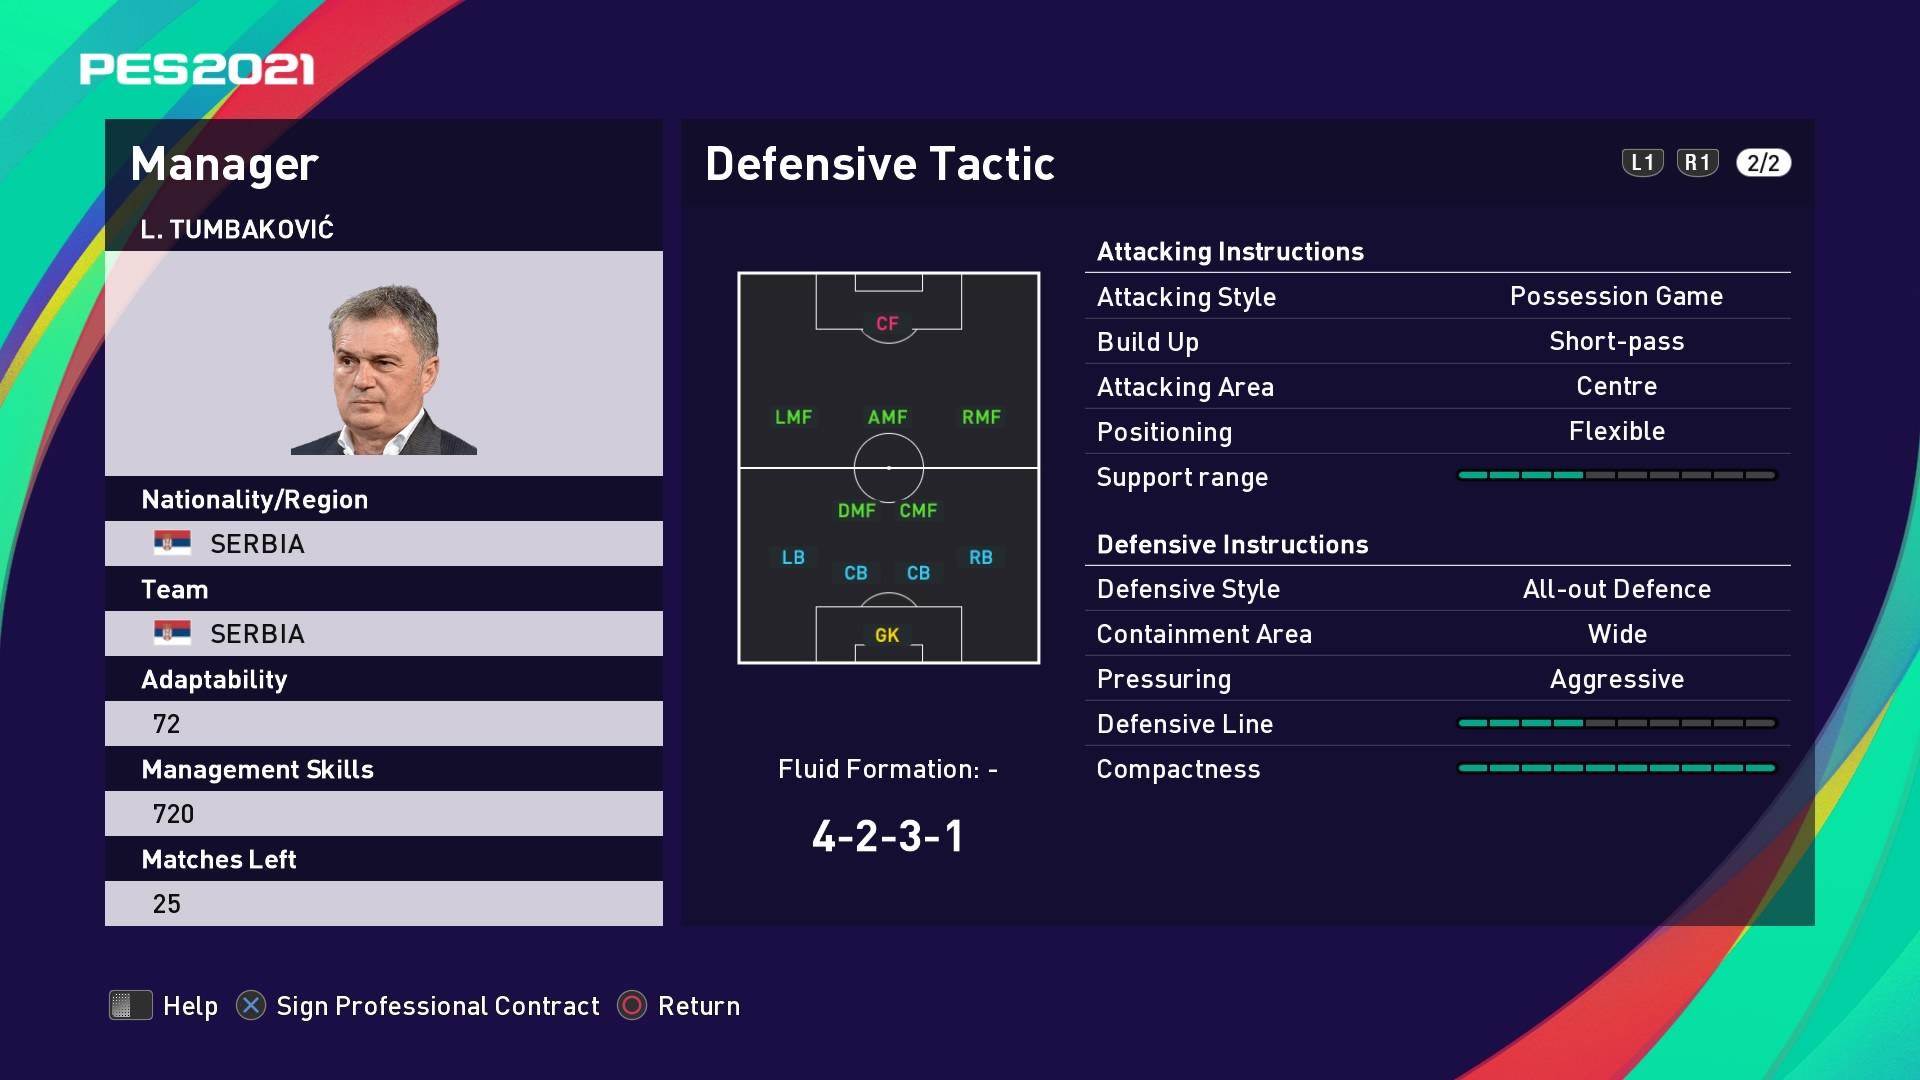 L. Tumbaković (Ljubiša Tumbaković) Defensive Tactic in PES 2021 myClub